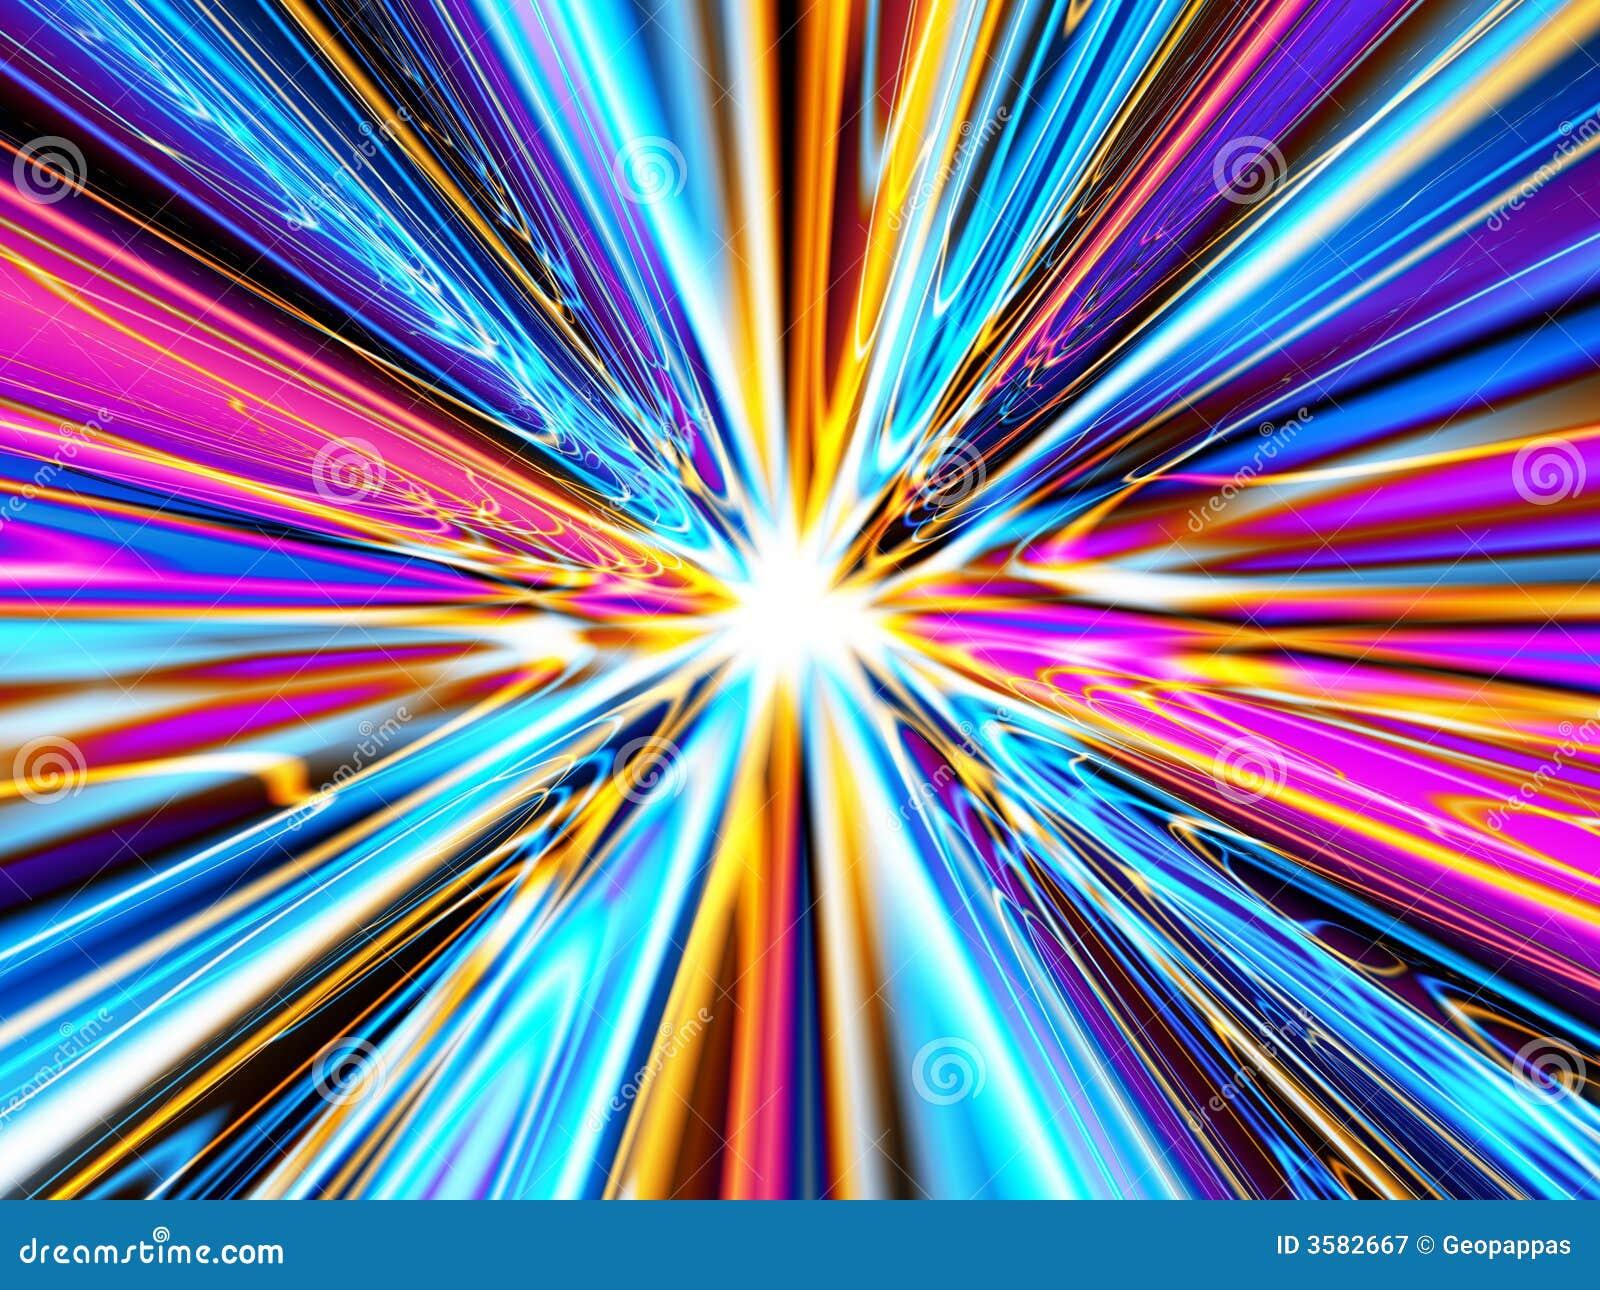 Speed of Light Background